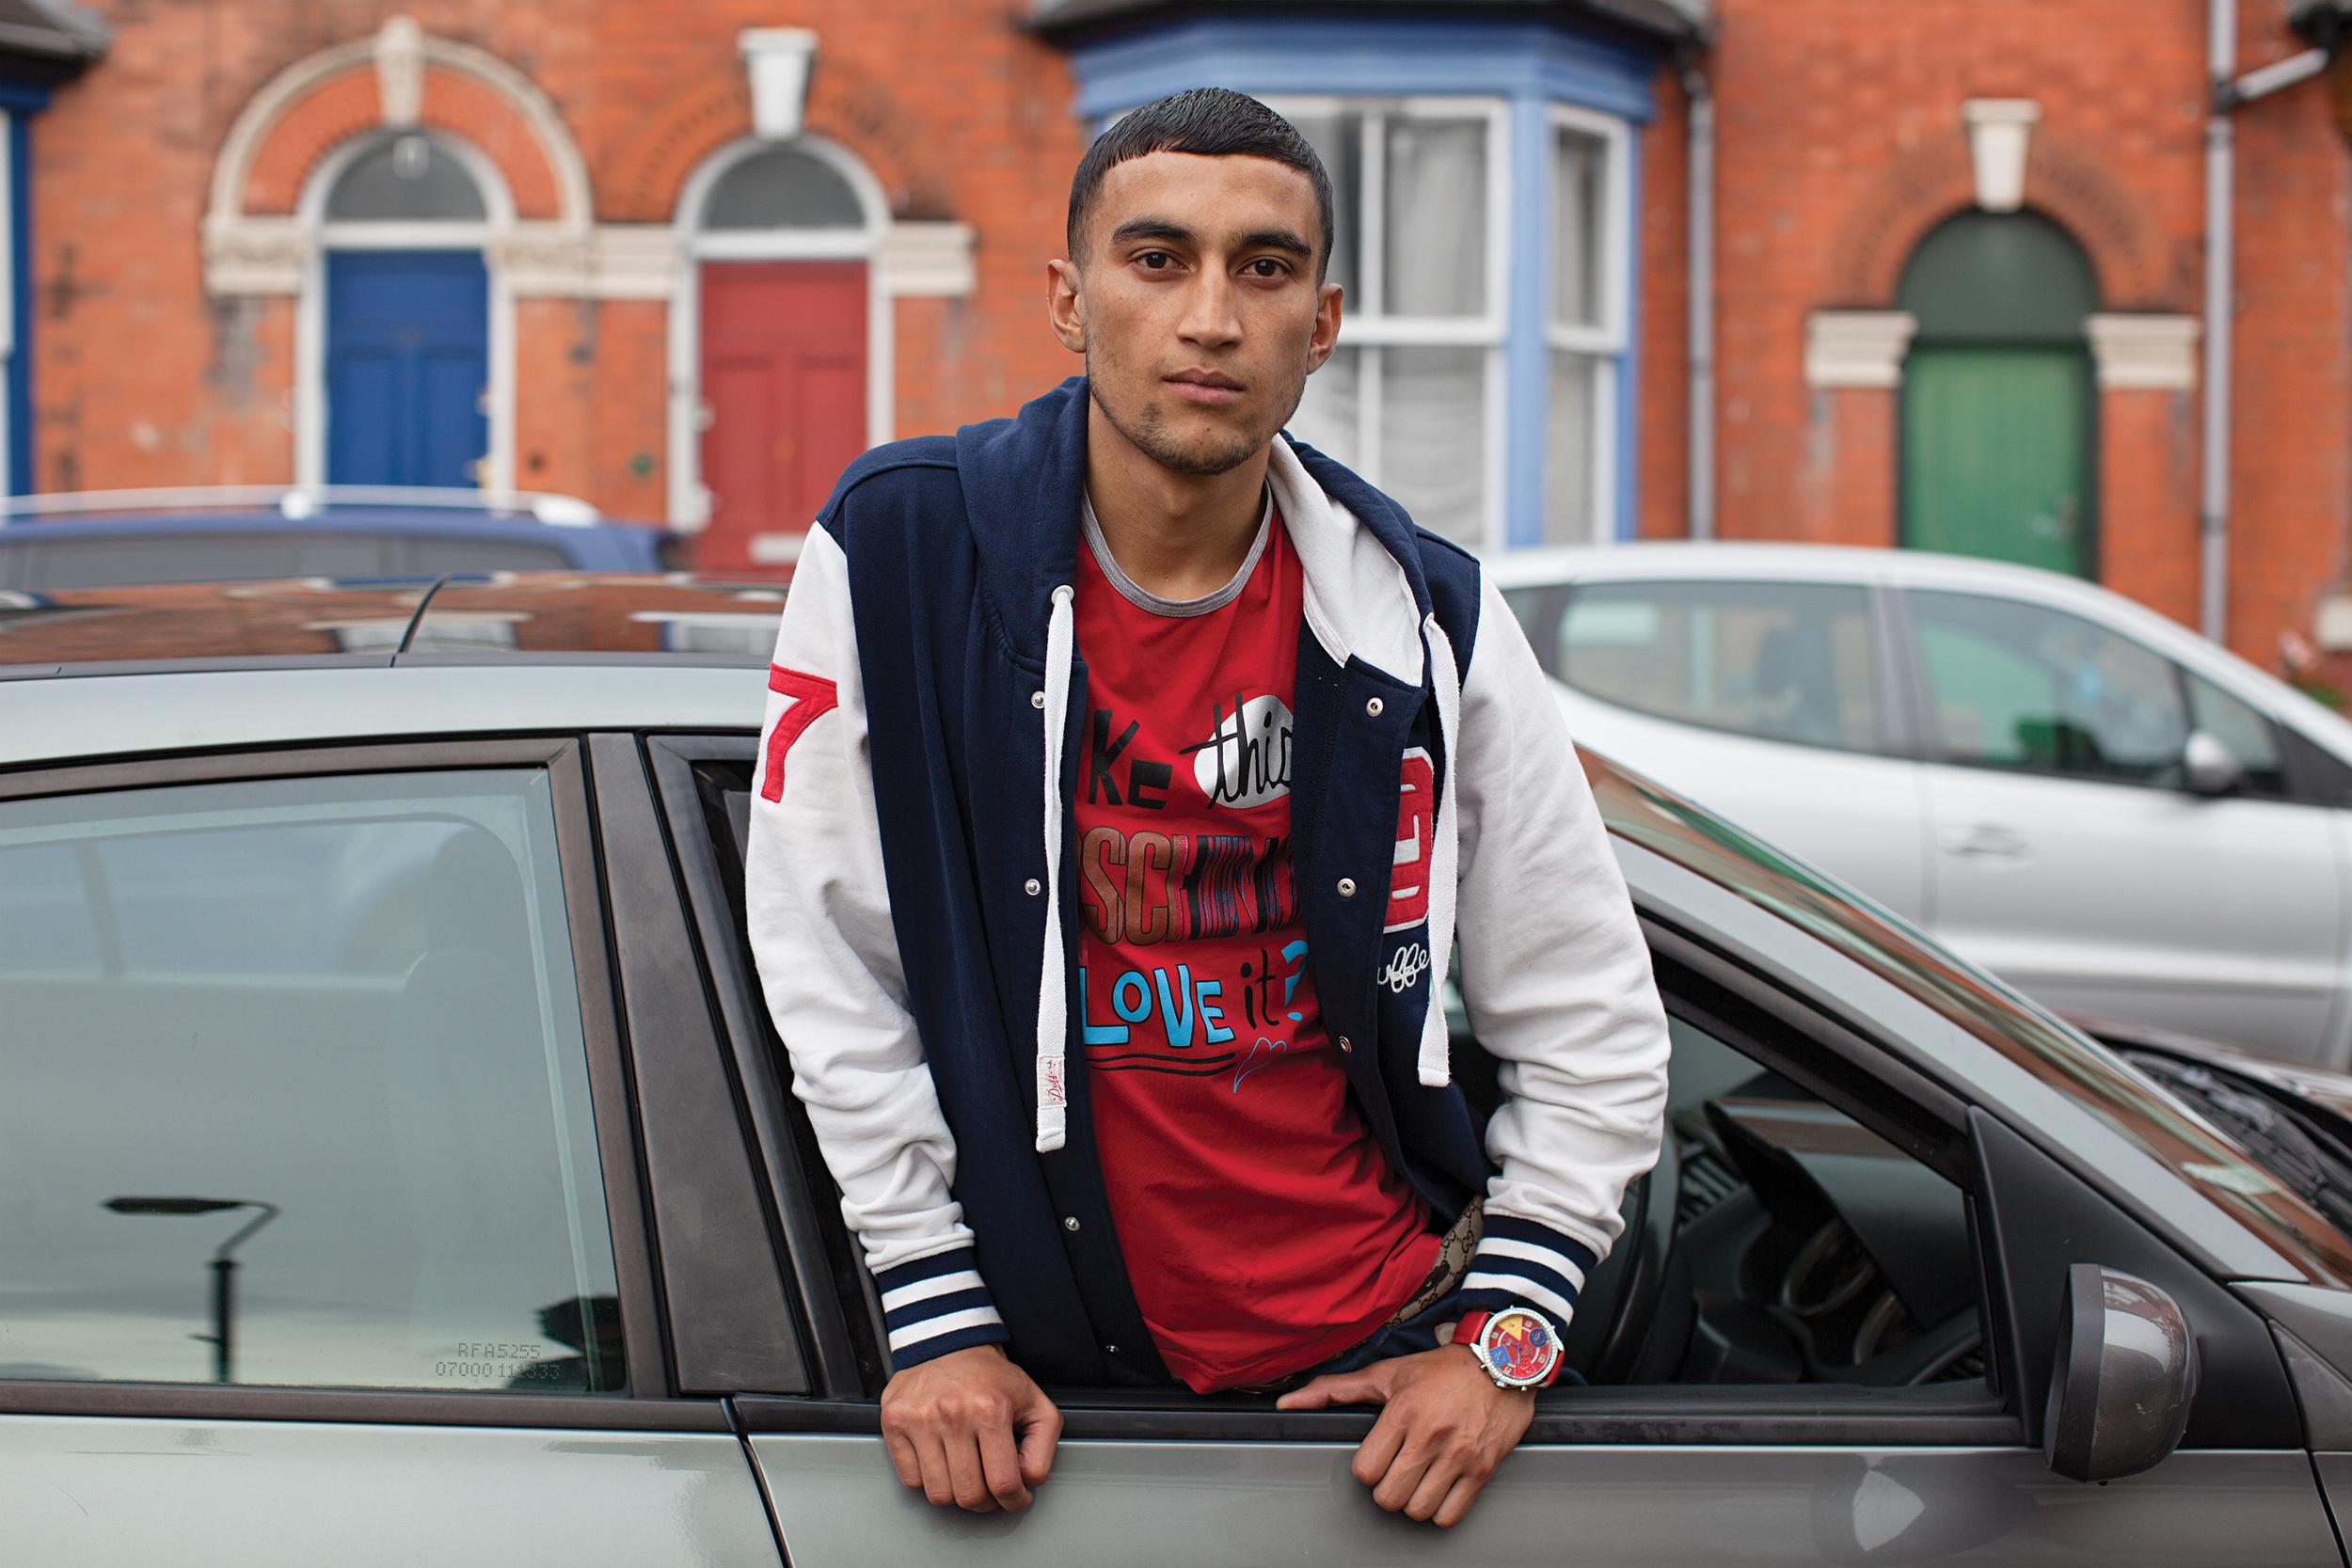 Red T-Shirt, baseball jacket, car © Mahtab Hussain - You Get Me?.jpg